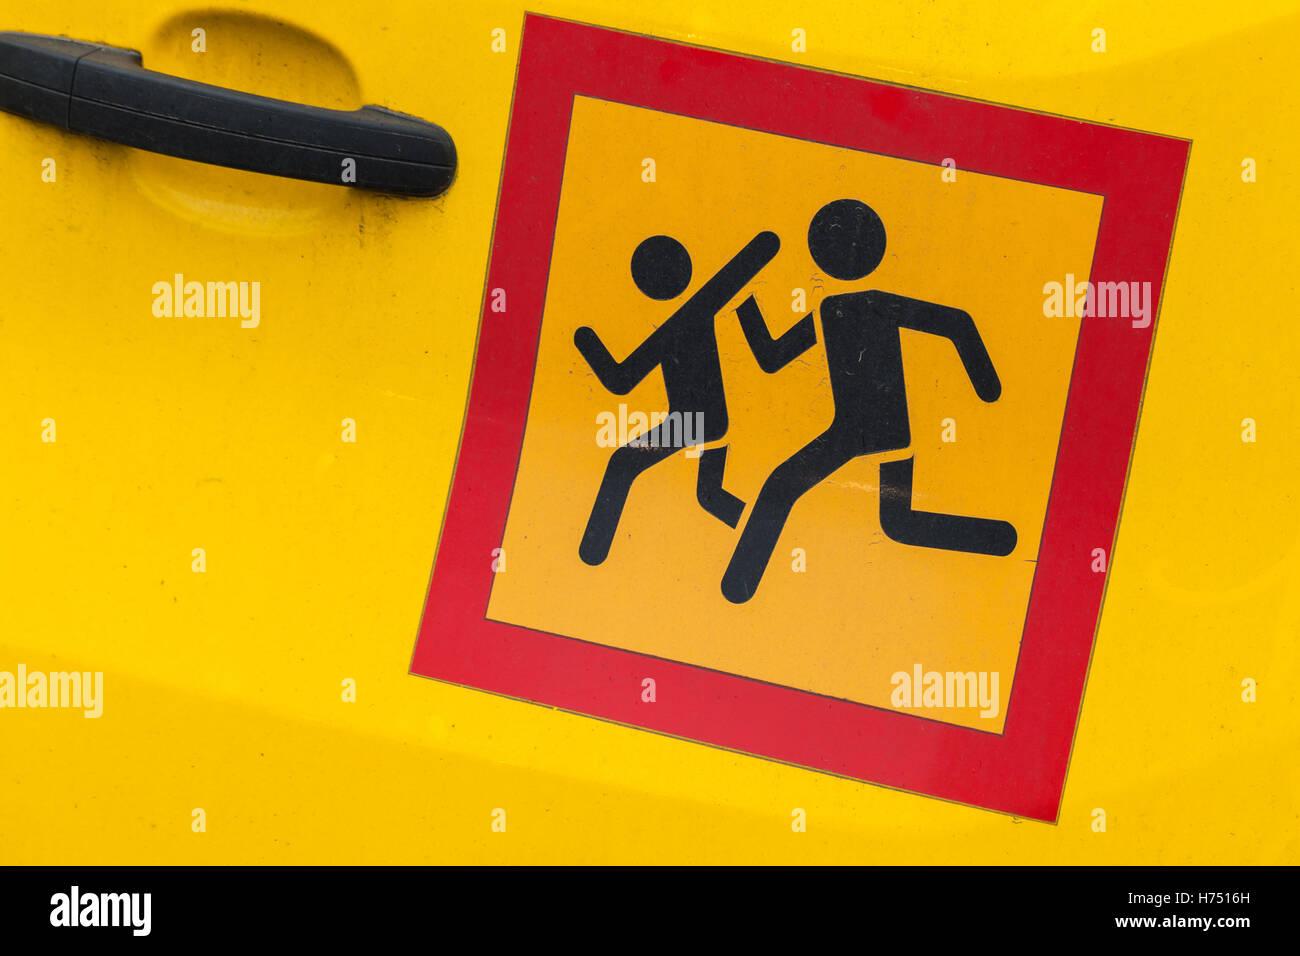 Square yellow Сaution children transportation sign in red frame, sticker on school minivan door - Stock Image